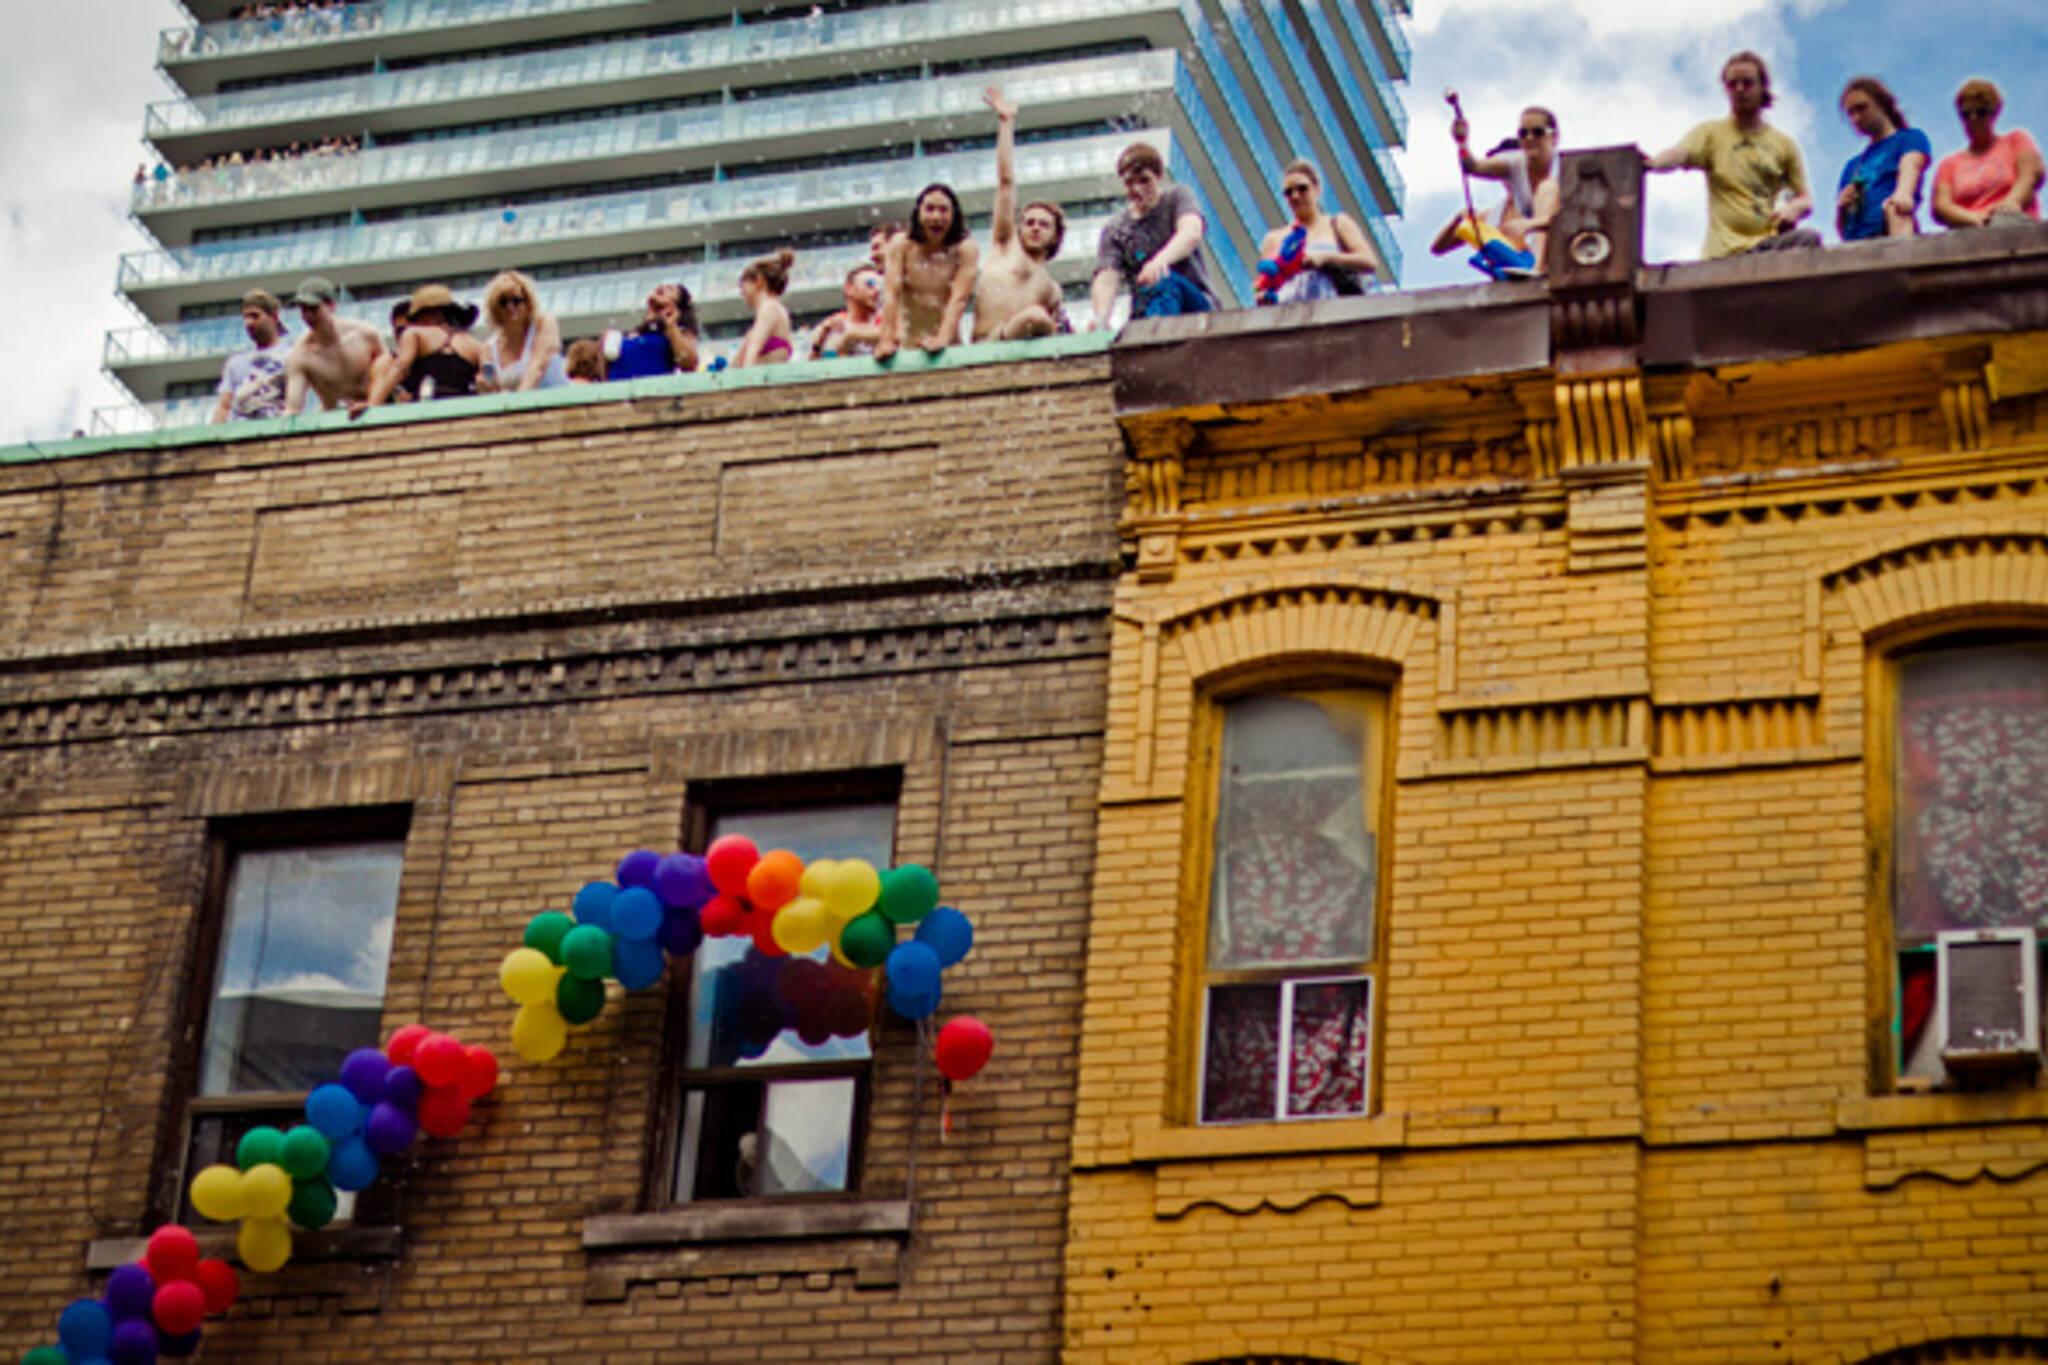 Pride funding safe 2012